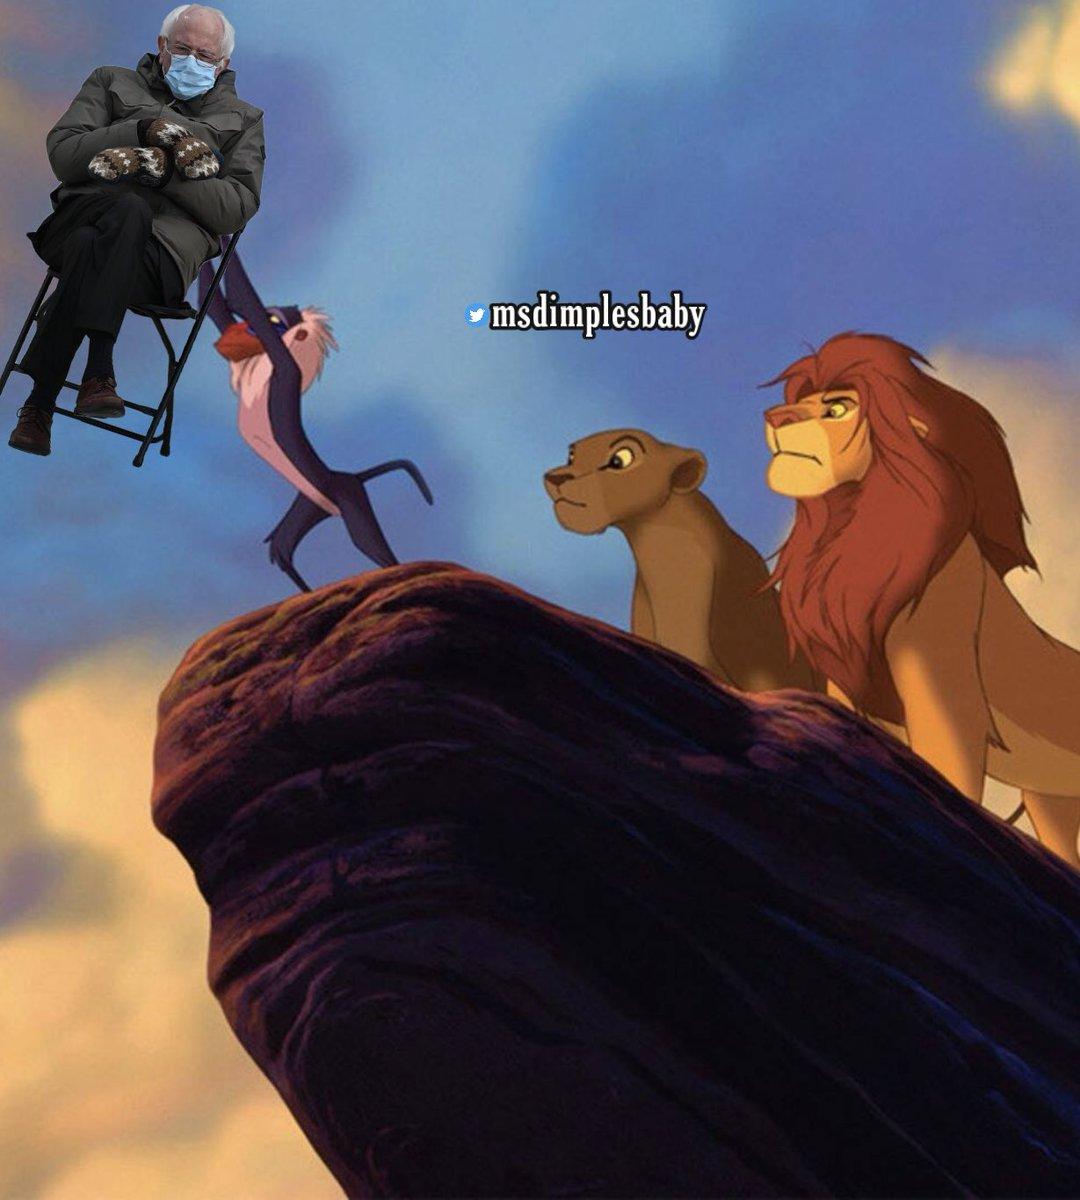 😂 #LionKing #TheLionKing #BernieSandersMittens #BernieSandersmemes #BernieSanders